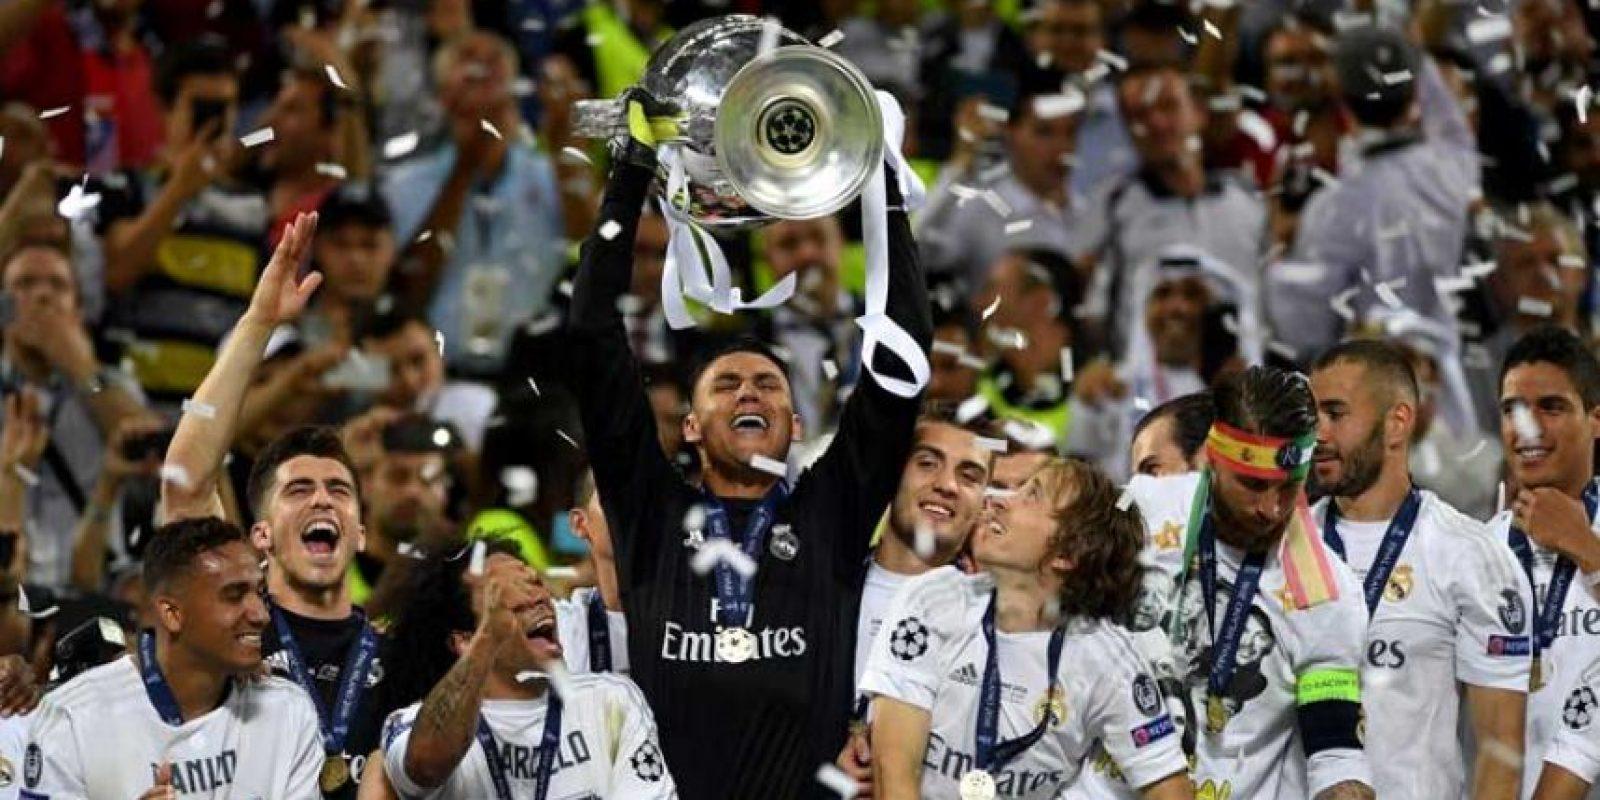 Real Madrid ganó la Champions League tras derrotar al Atlético en penales. Foto:Getty Images